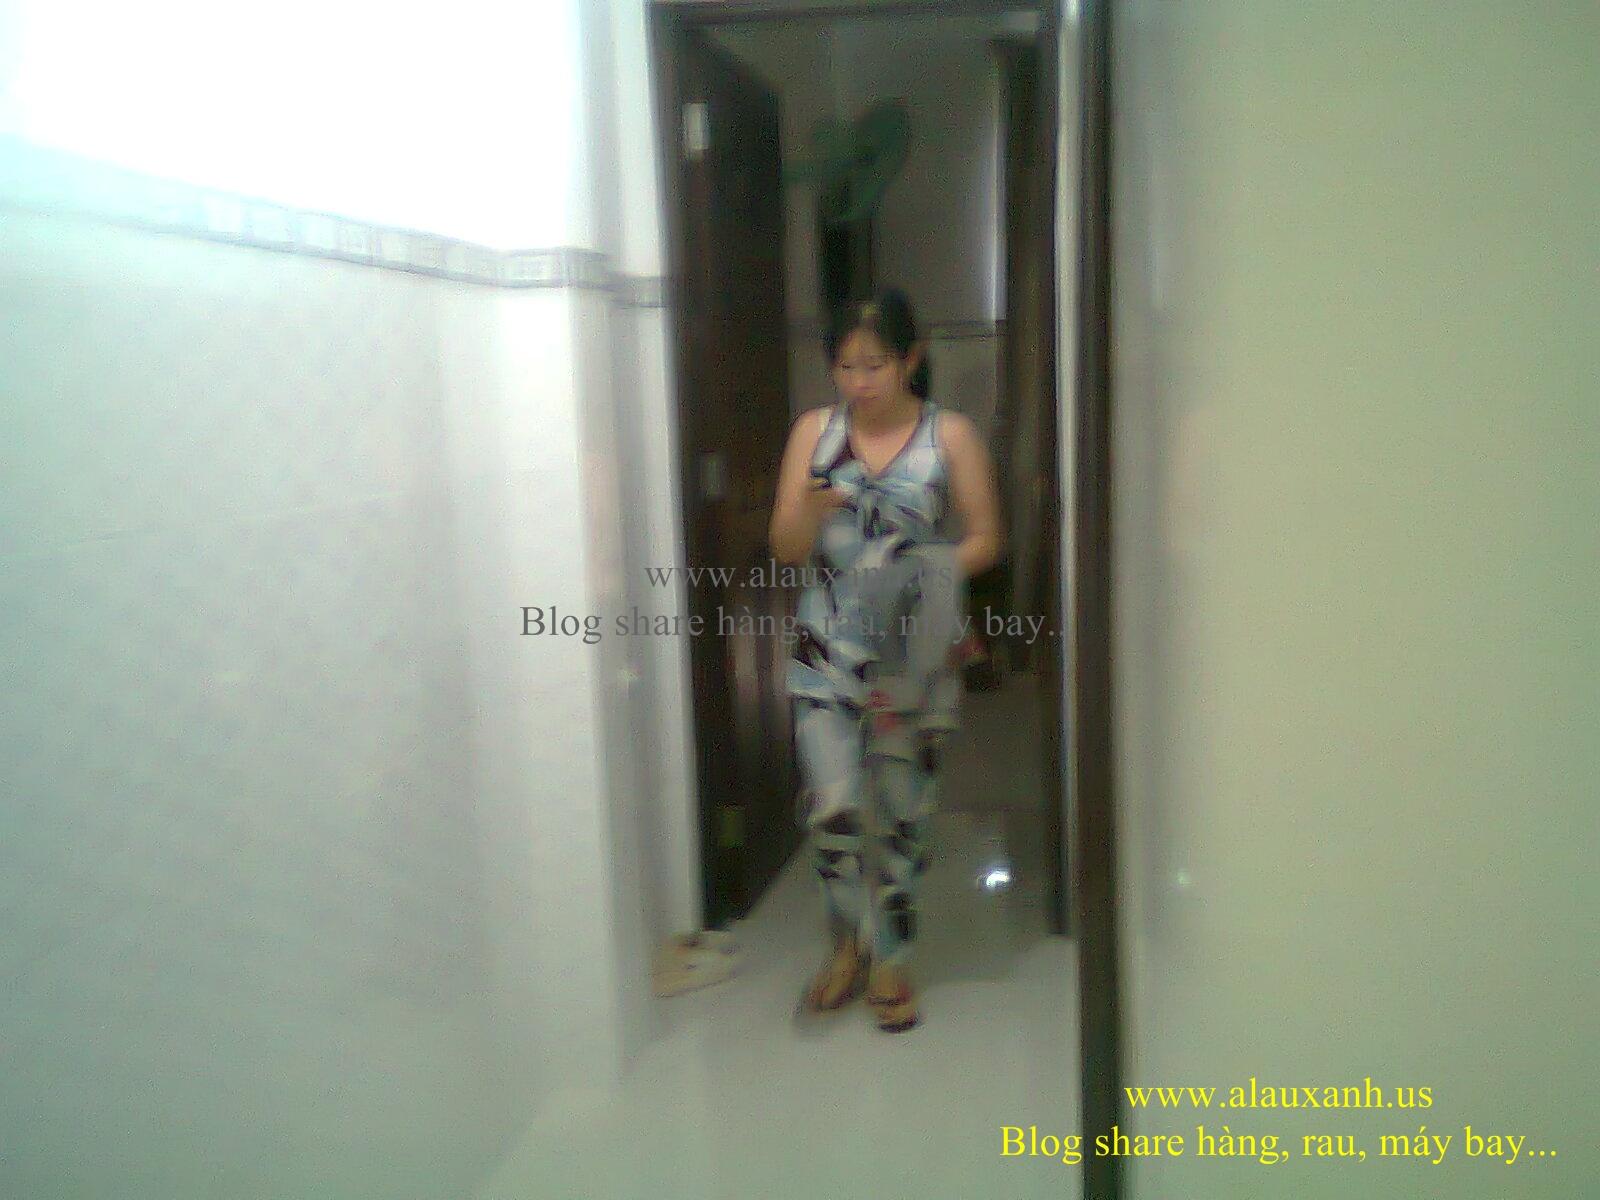 MBBG Hinh http://muaban.gia24.com/hinh+rau+va+mbbg.html